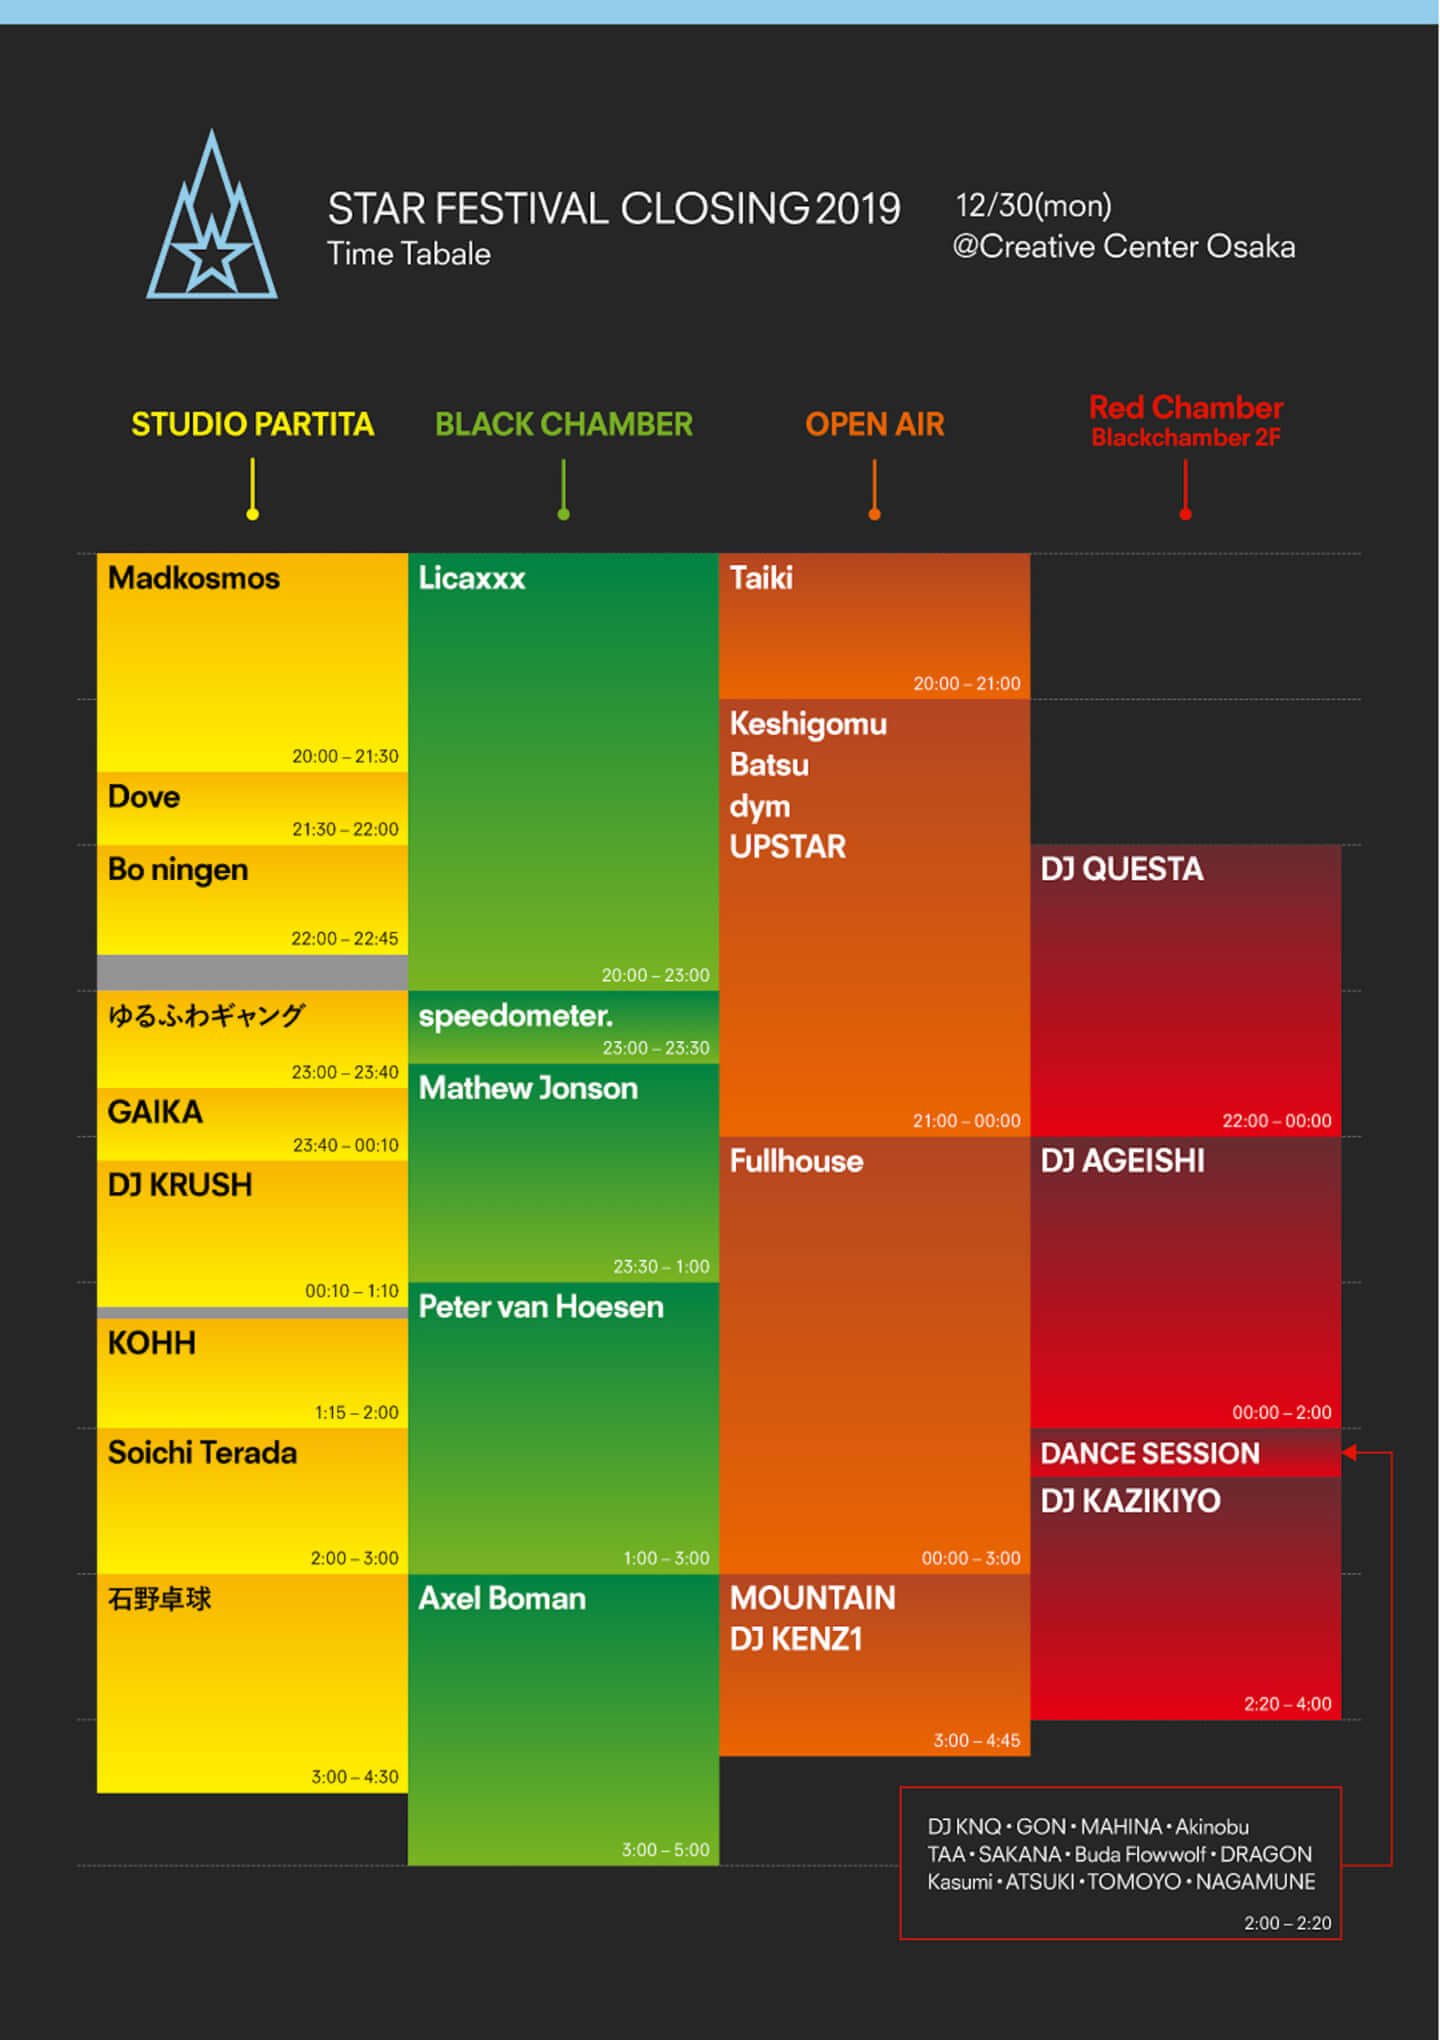 <STAR FESTIVAL CLOSING>に〈Warp Records〉からGAIKA緊急参戦!タイムテーブルなど最終詳細が発表 music1226_stafestt_03-1440x2040